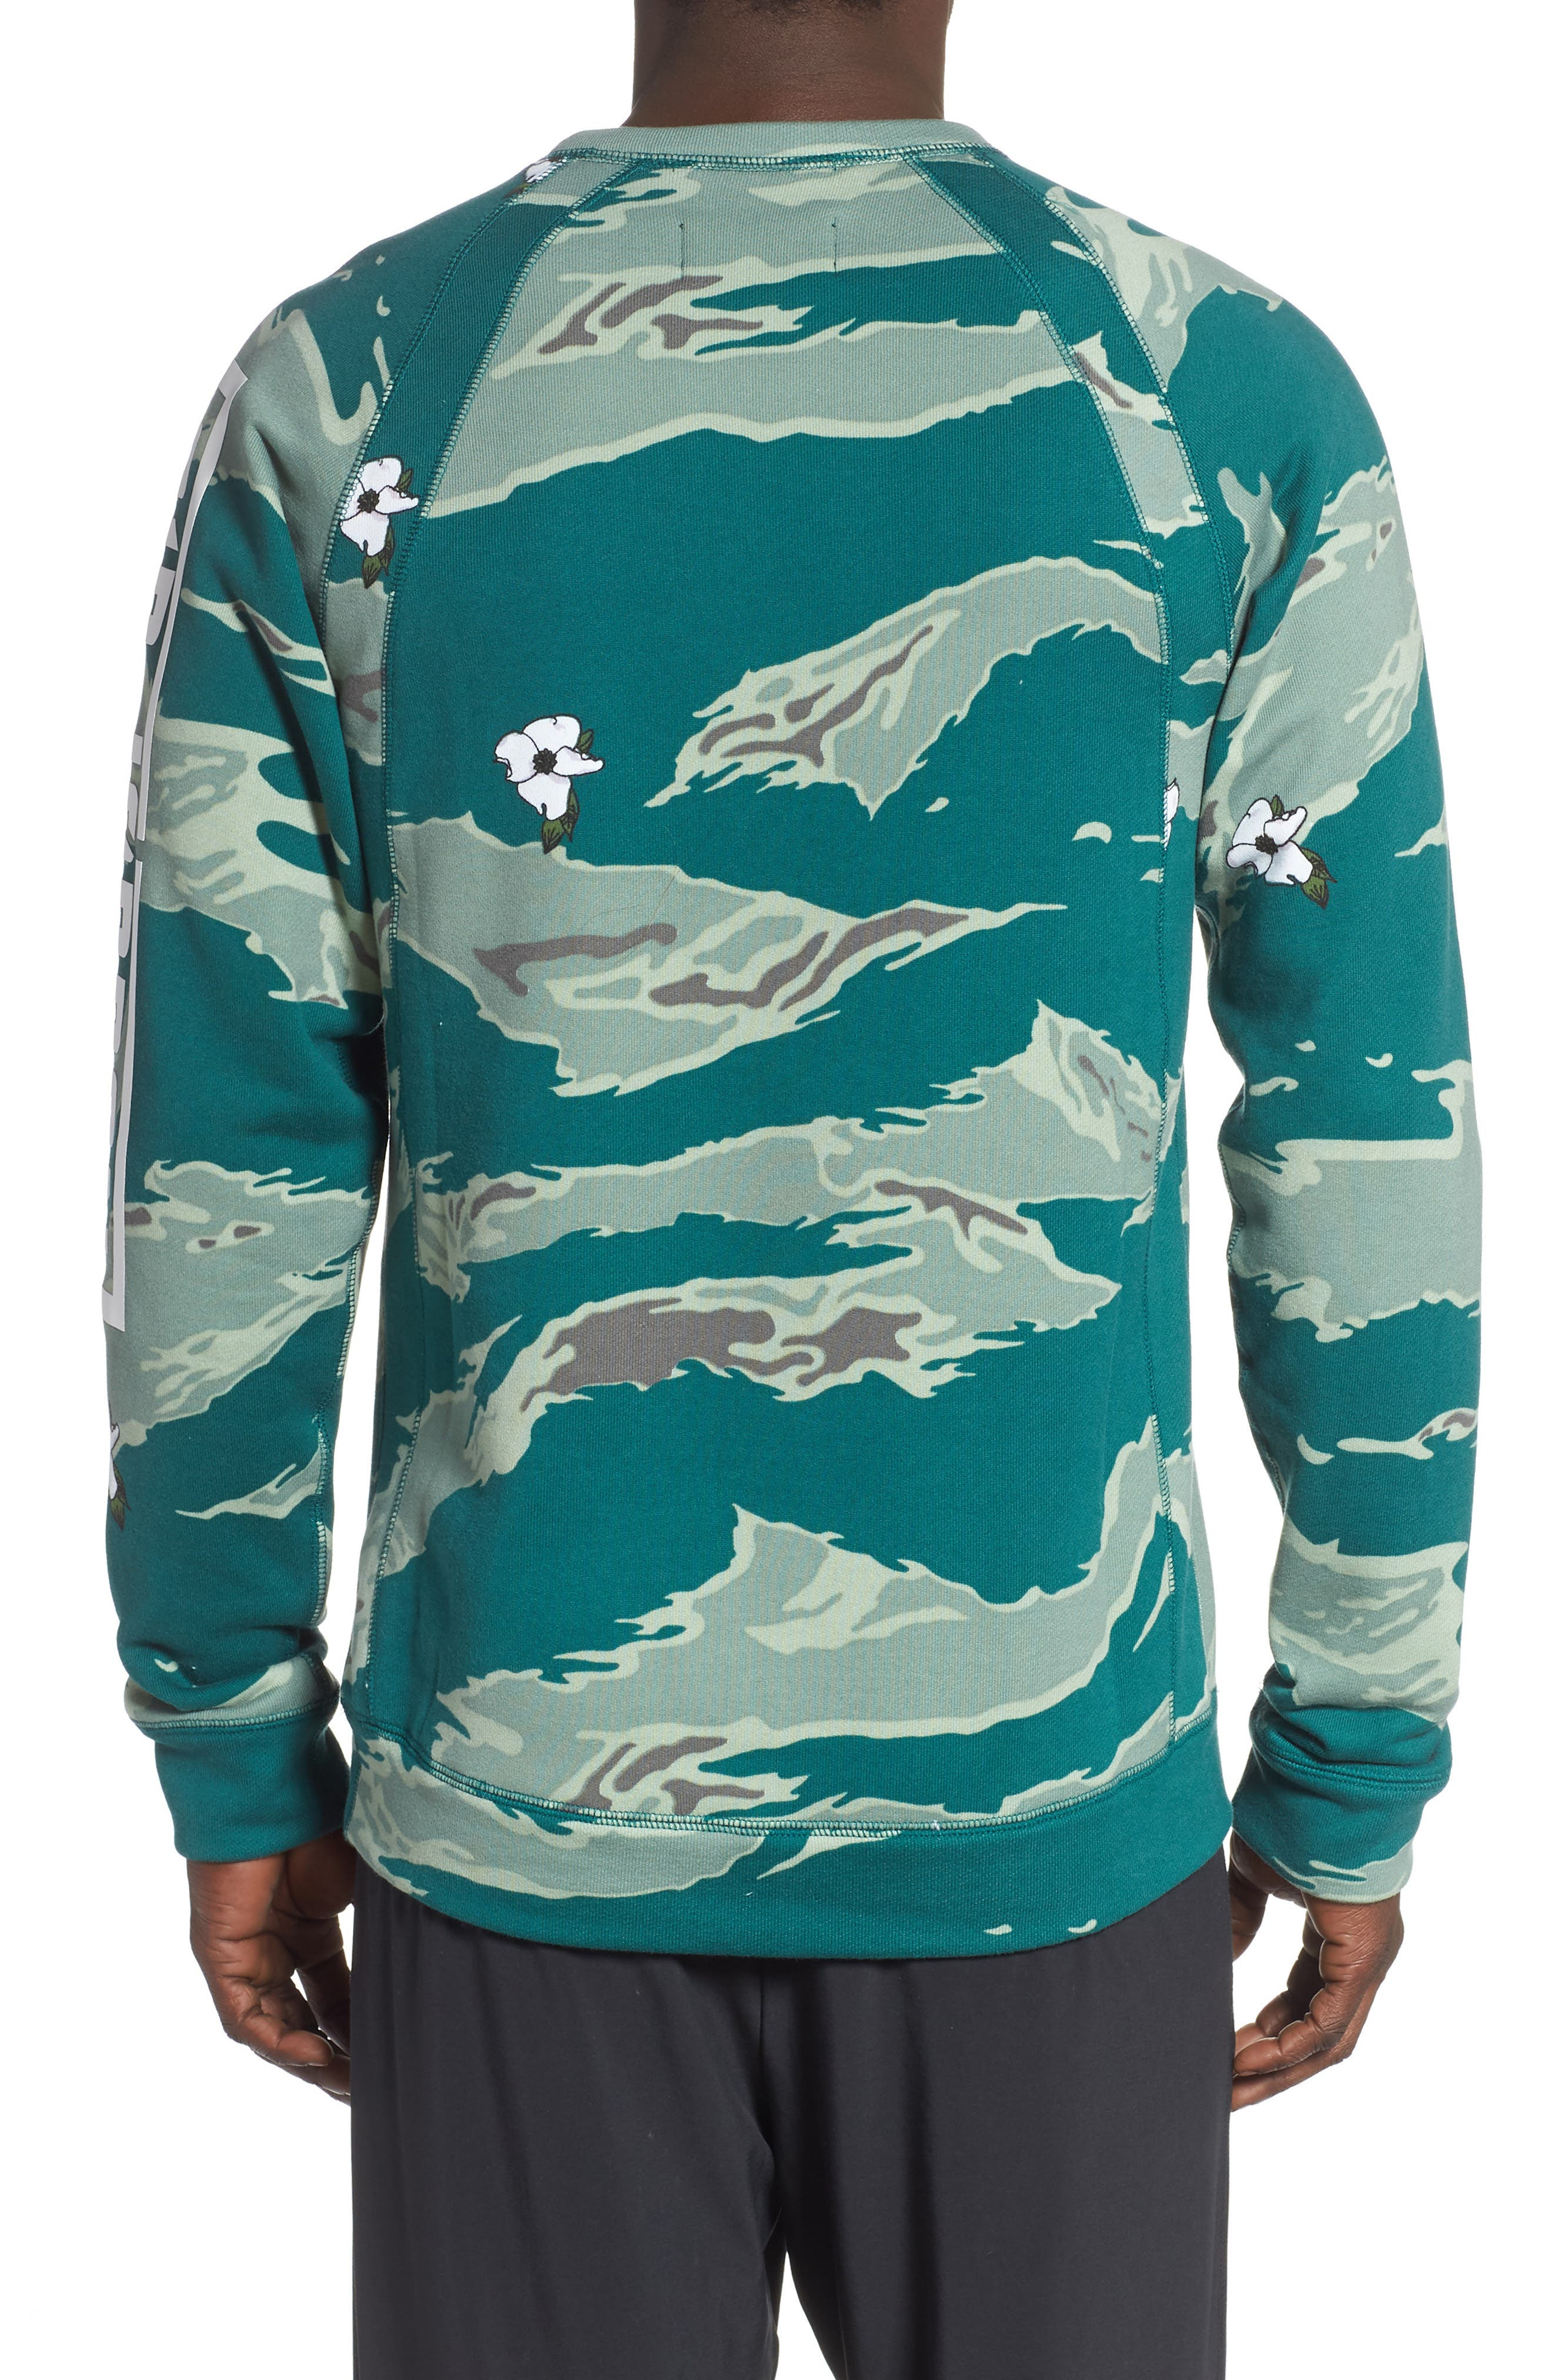 e30feed6fdfdcb Men s Jordan Hoodies   Sweatshirts